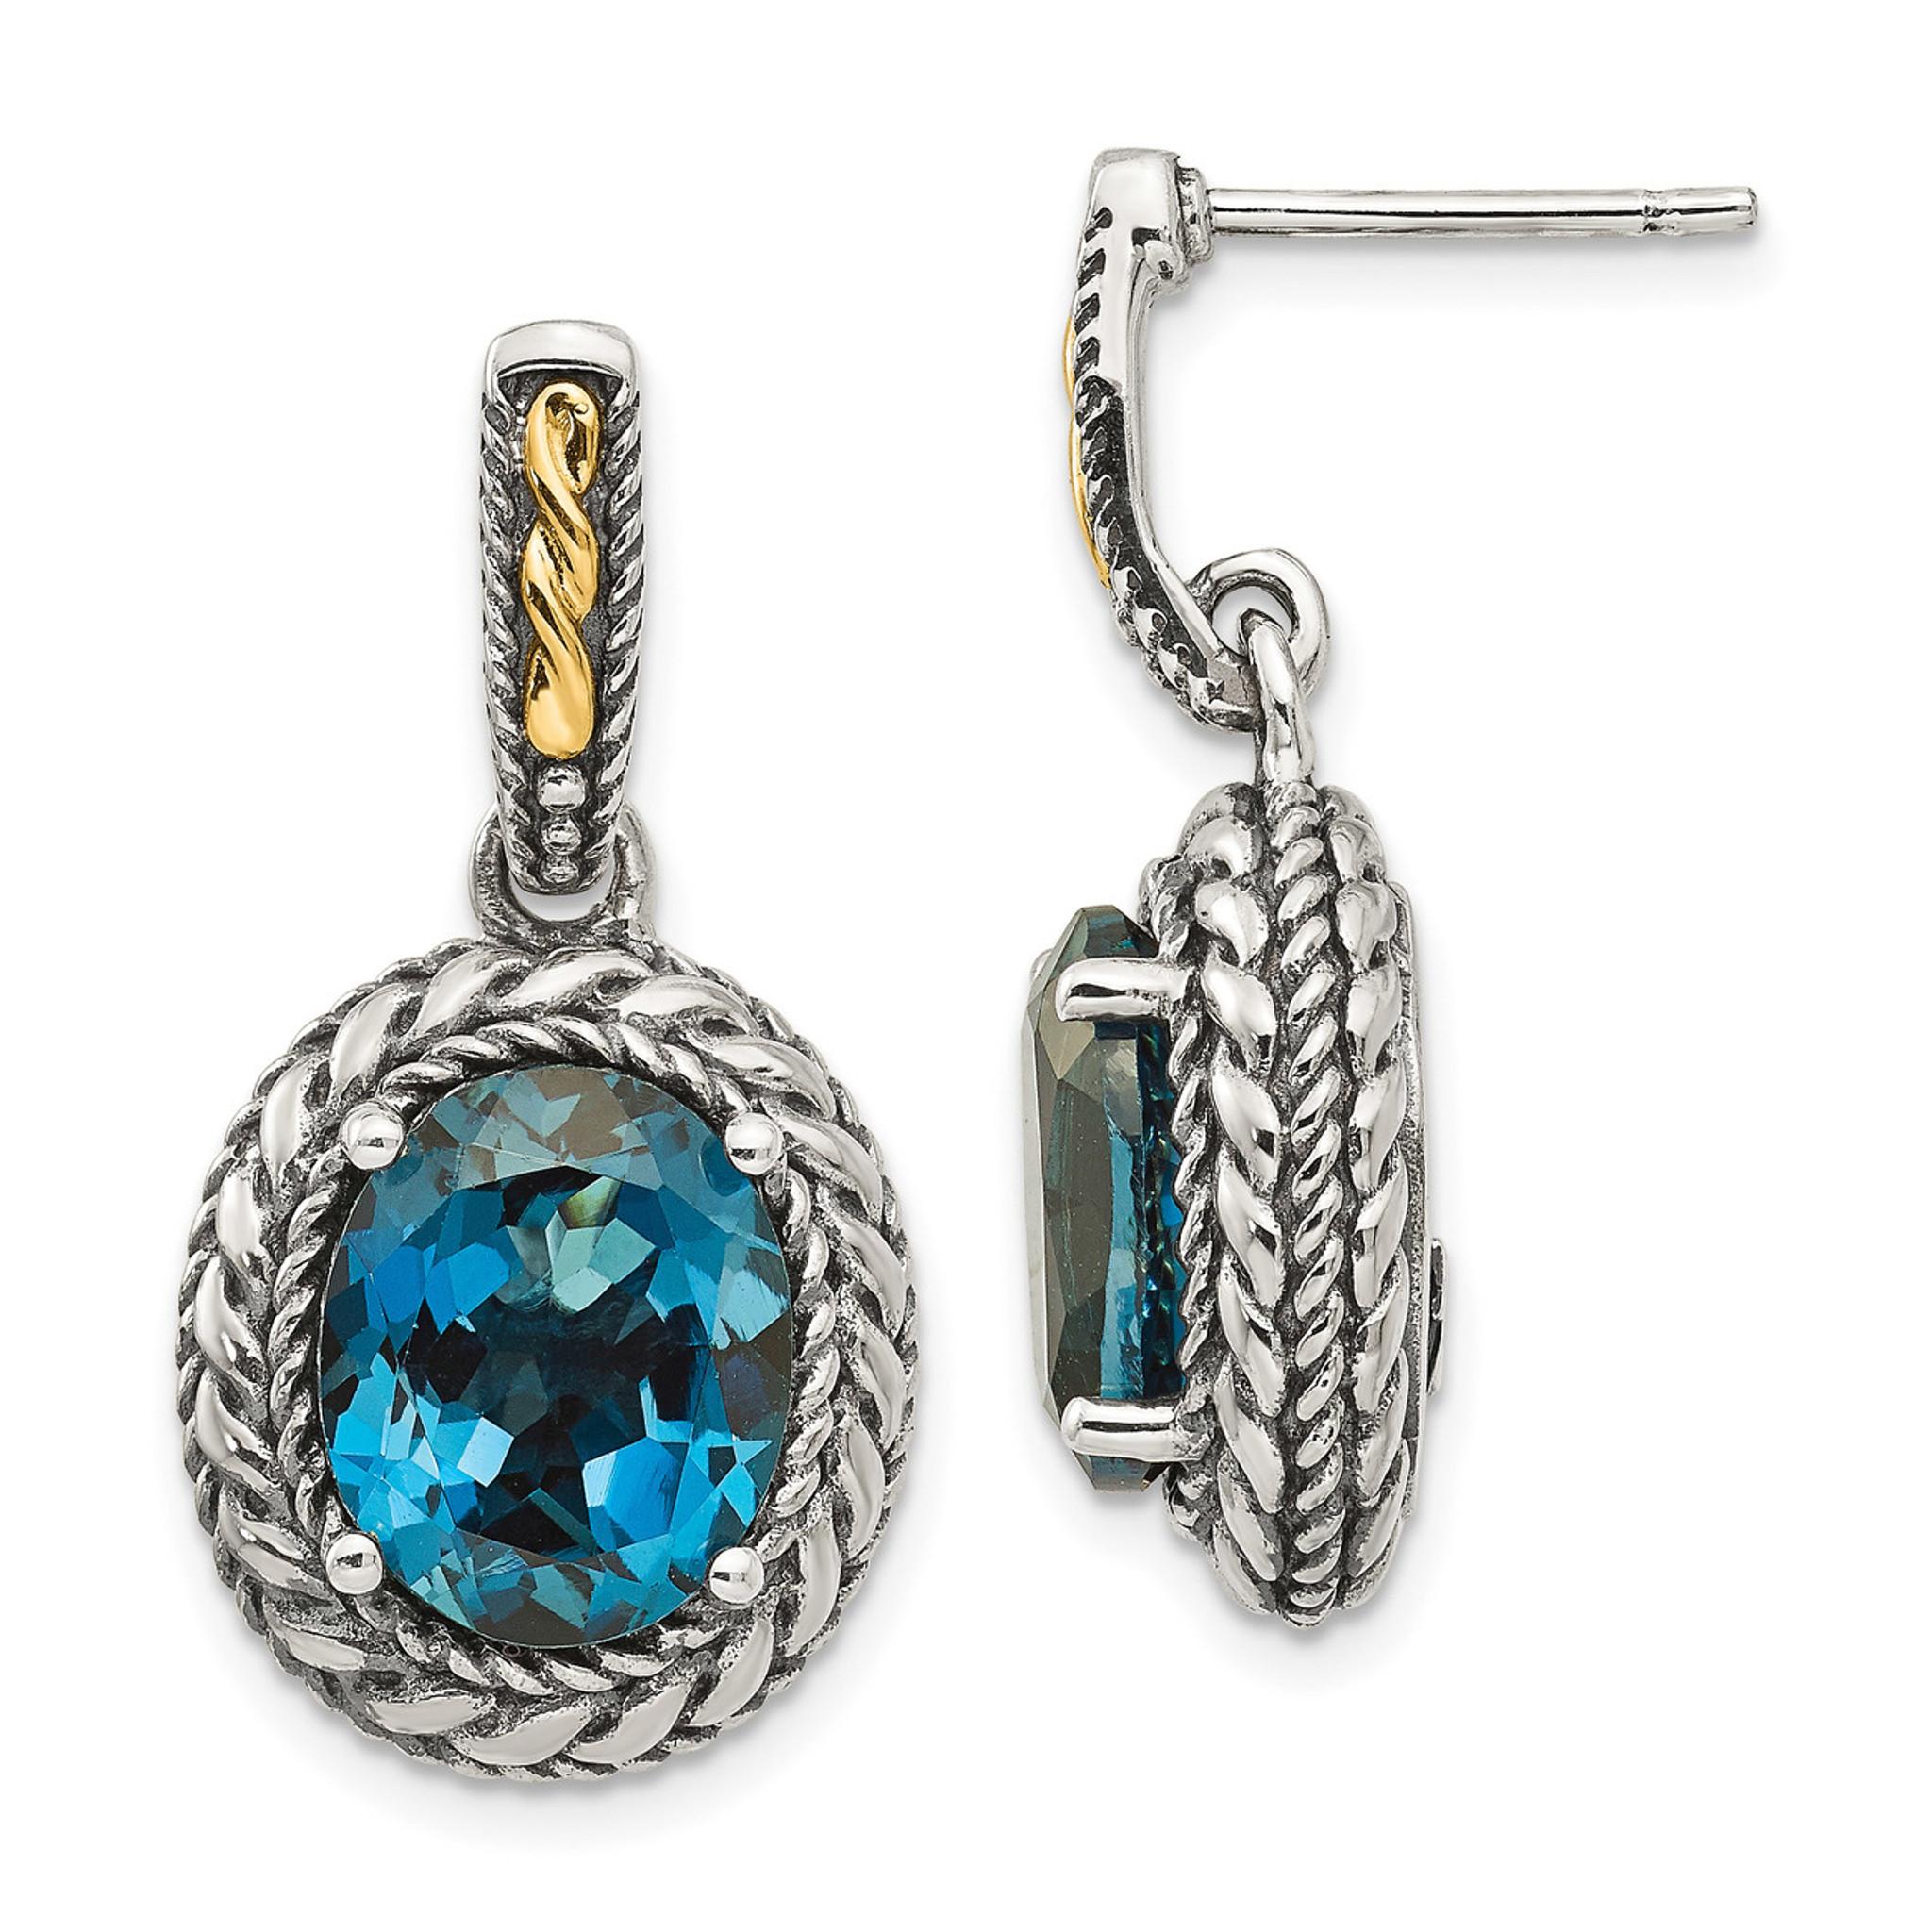 london blue topaz earrings sterling silver 14k gold by. Black Bedroom Furniture Sets. Home Design Ideas